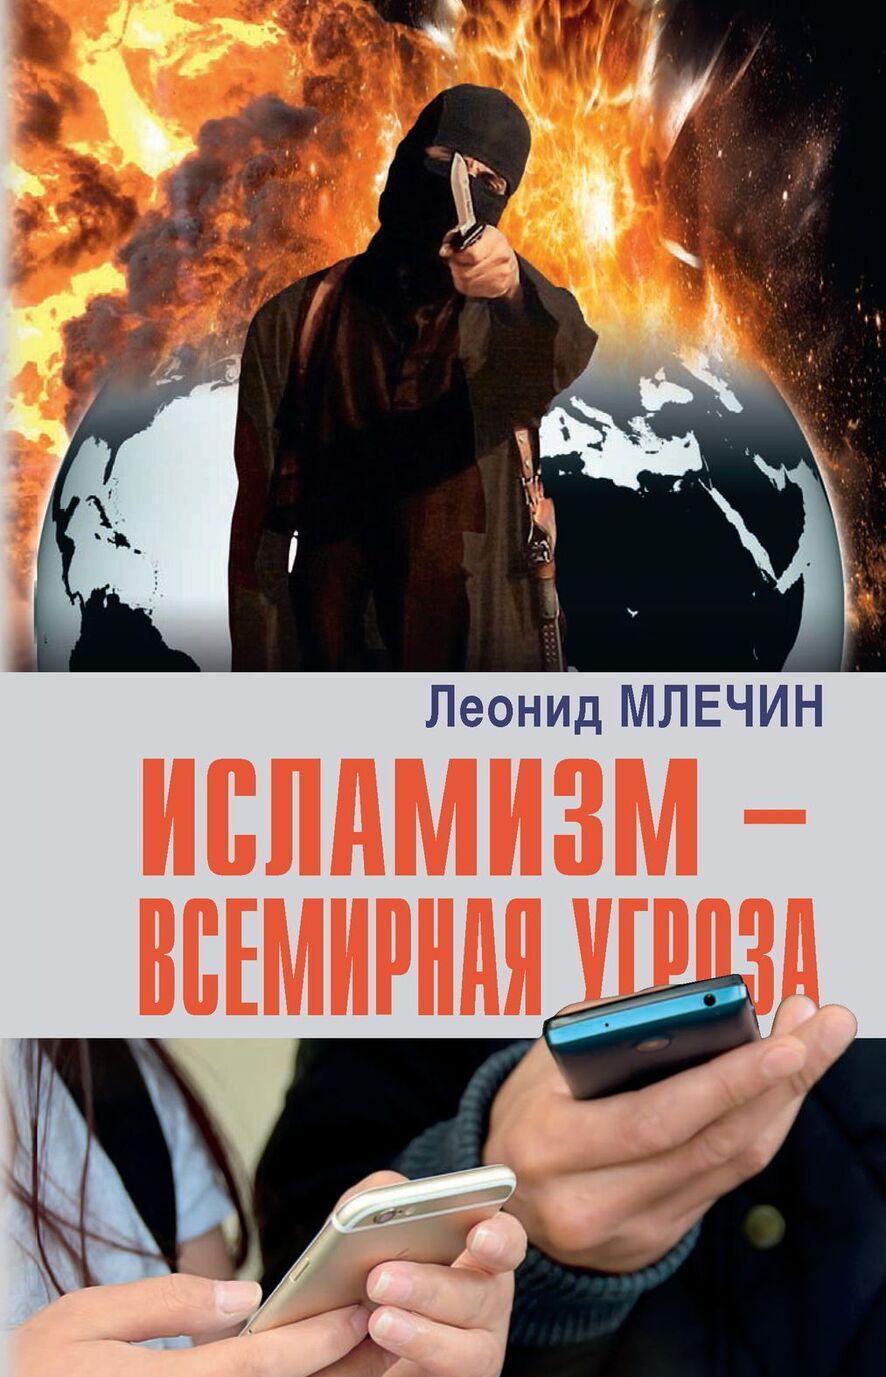 Islamizm - vsemirnaja ugroza | Mlechin Leonid Mikhajlovich